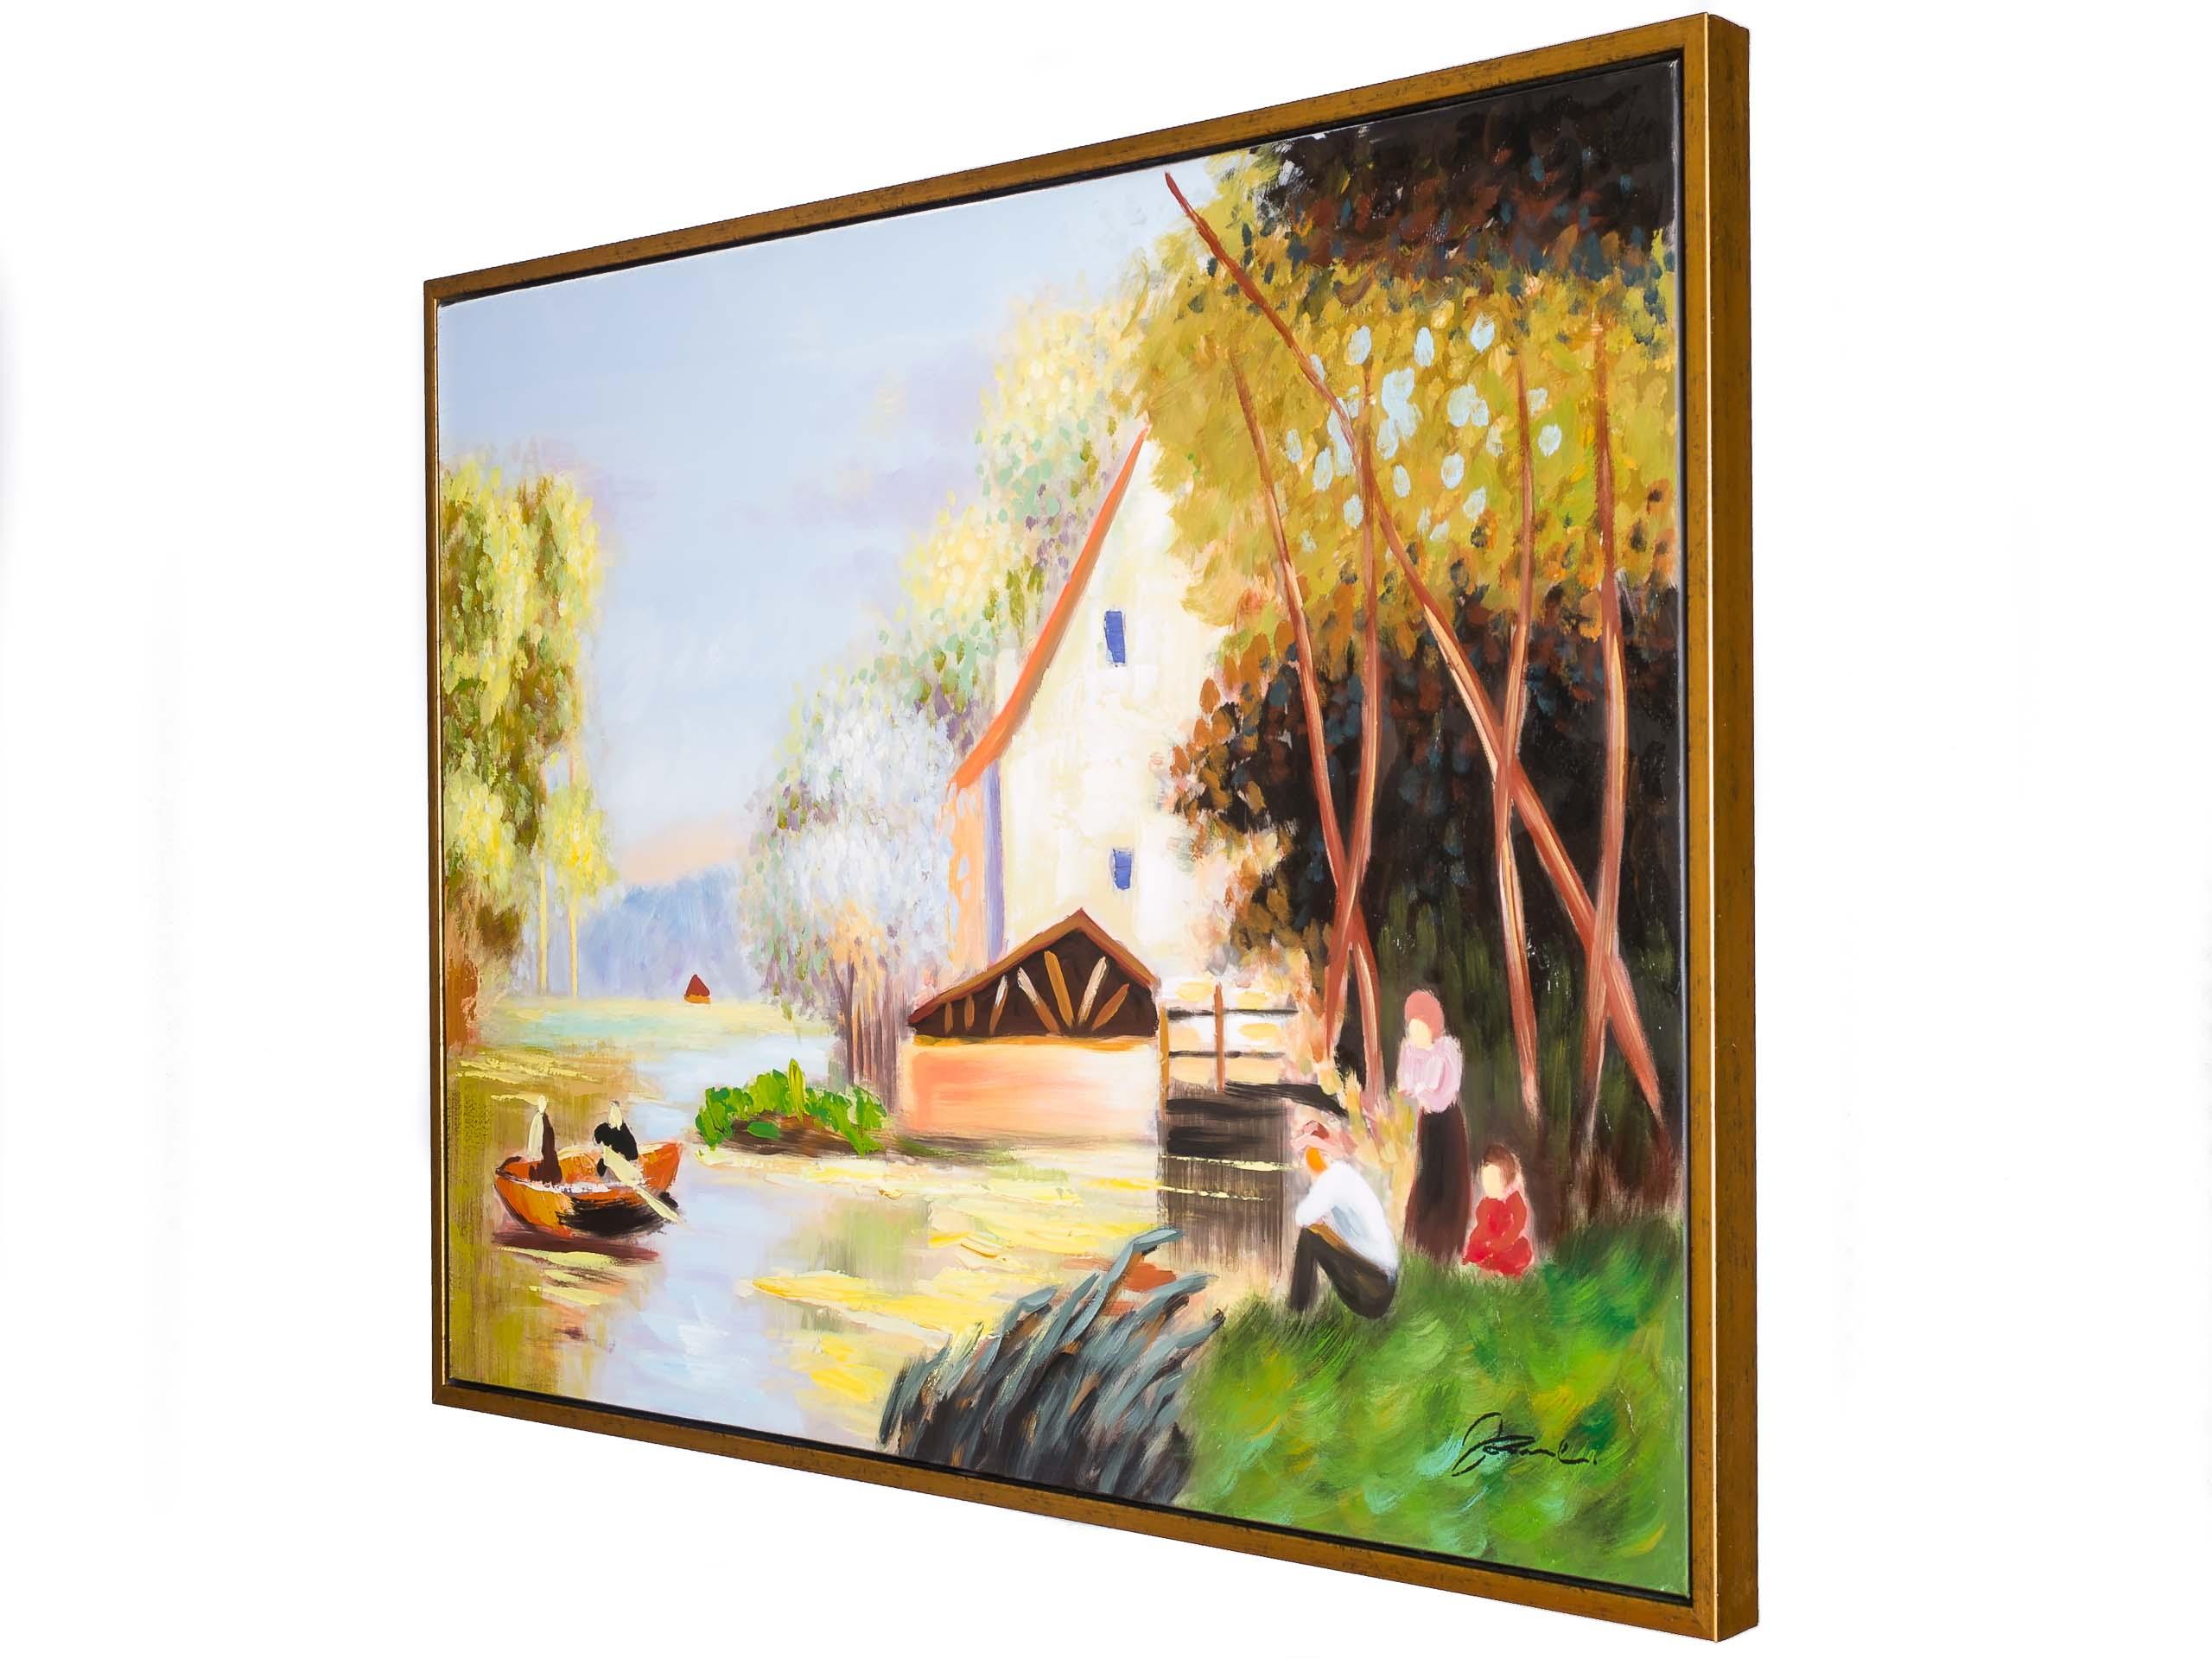 Original Gemälde Ölgemälde Bild Haus am See mit Rahmen modern 124cm